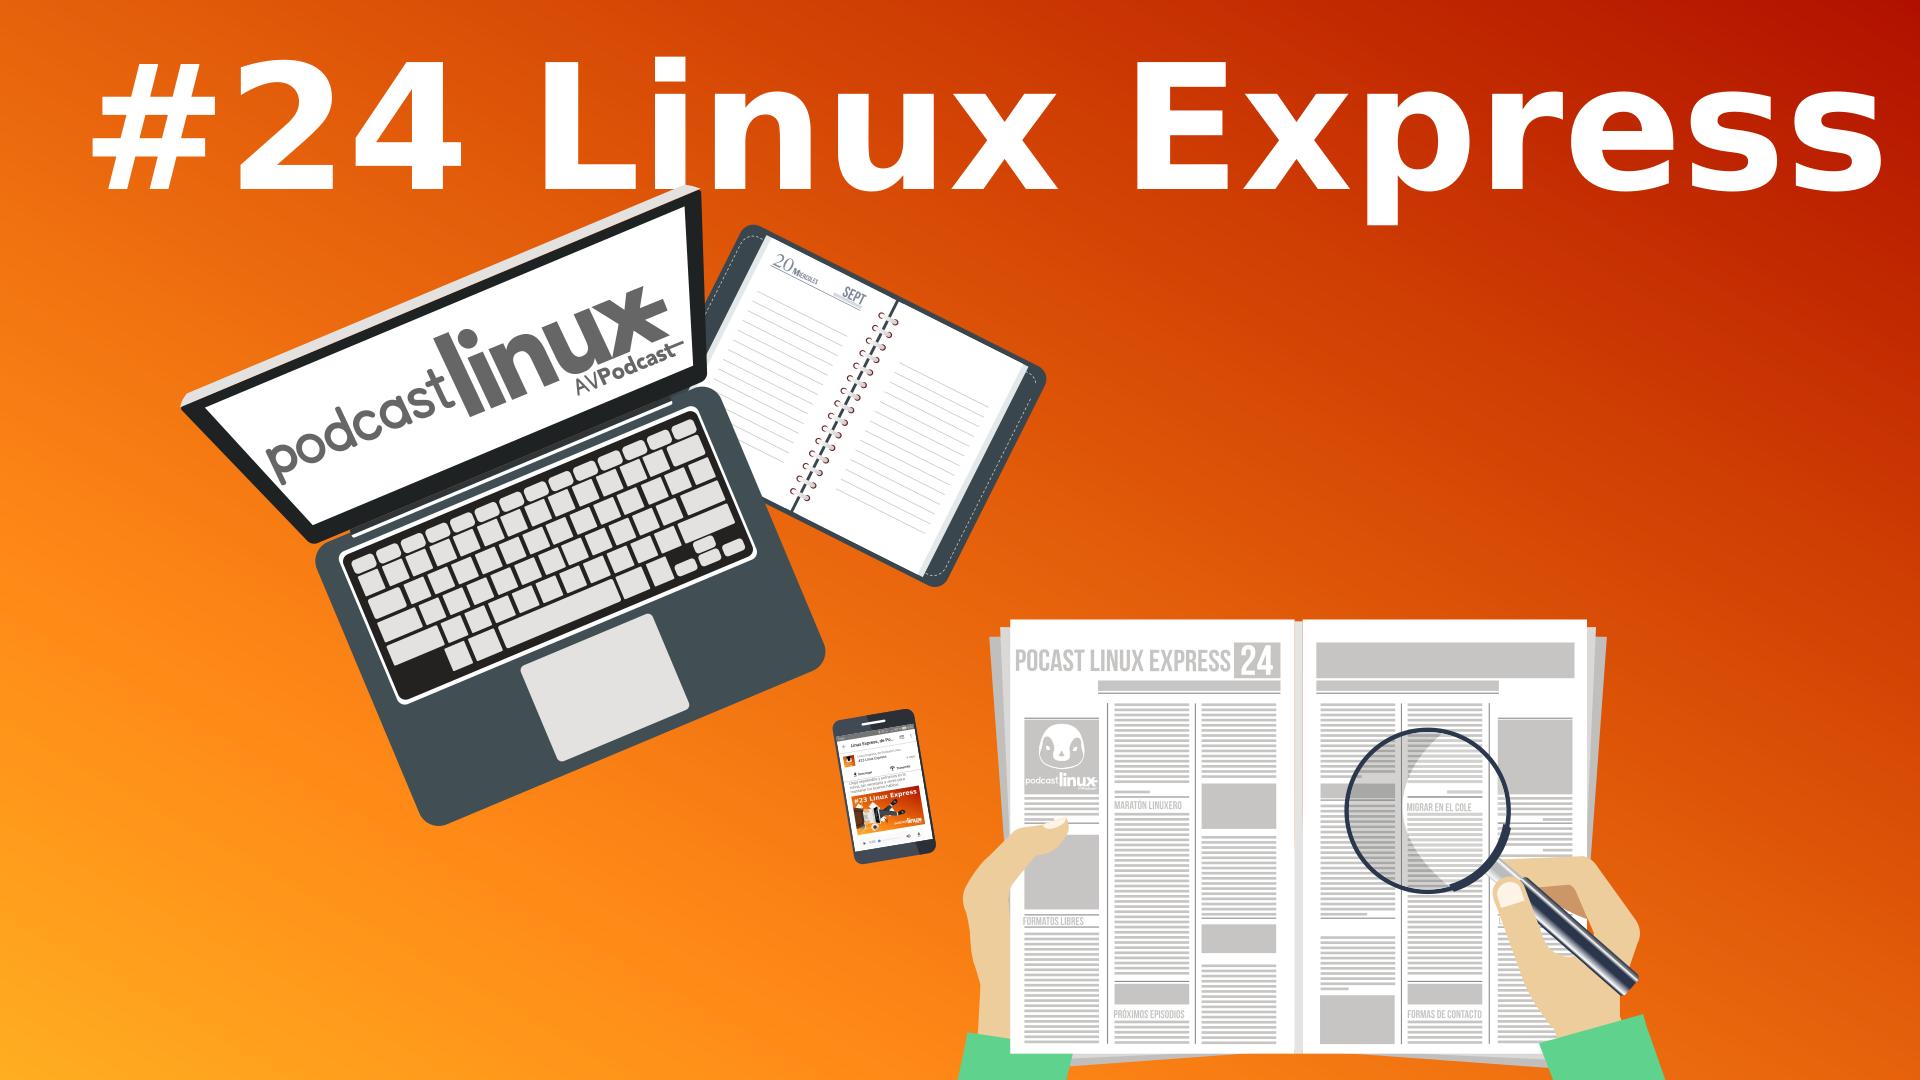 #24 Linux Express